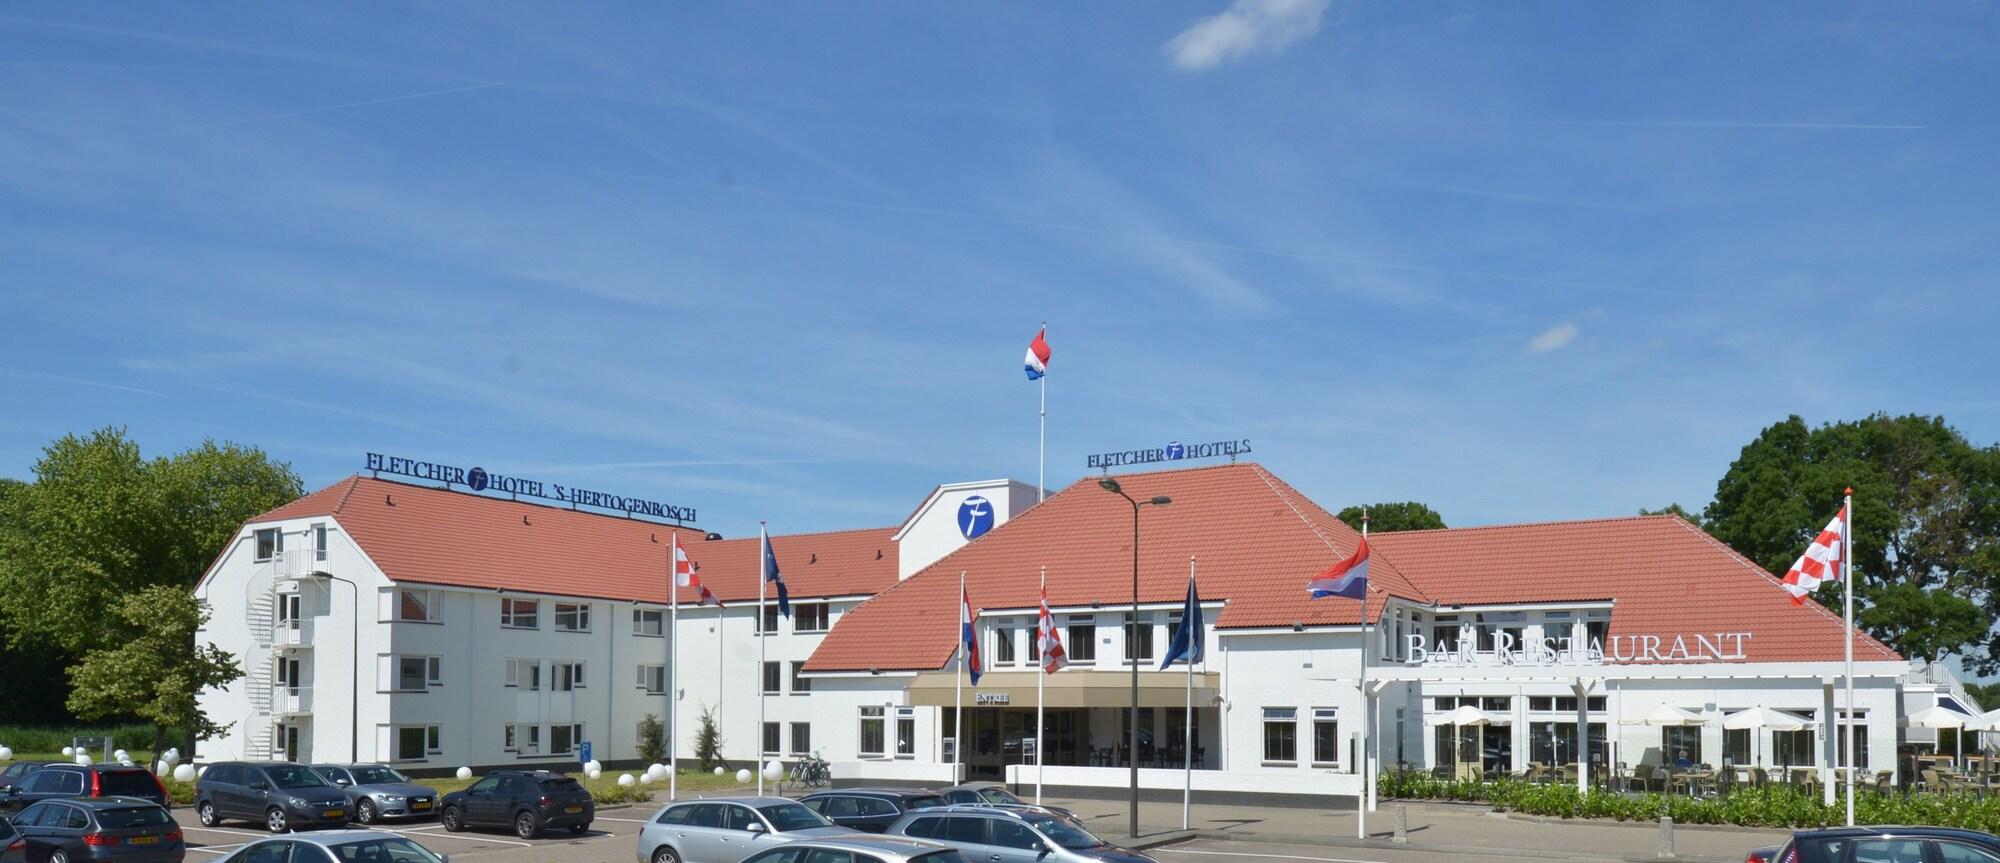 Fletcher Hotel-Restaurant's-Hertogenbosch, 's-Hertogenbosch